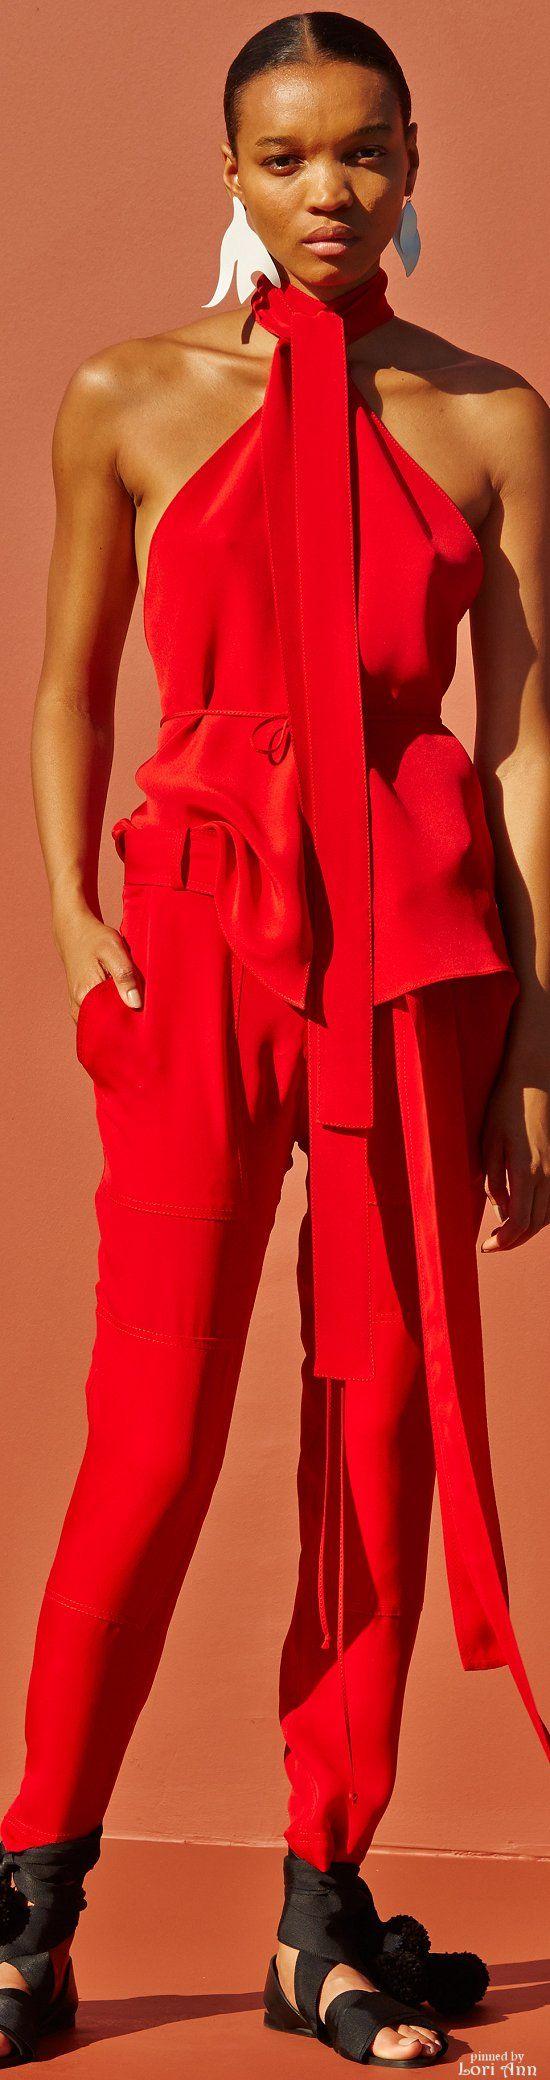 17 best ideas about red jumpsuit on pinterest elegant jumpsuit women 39 s red salopettes and. Black Bedroom Furniture Sets. Home Design Ideas